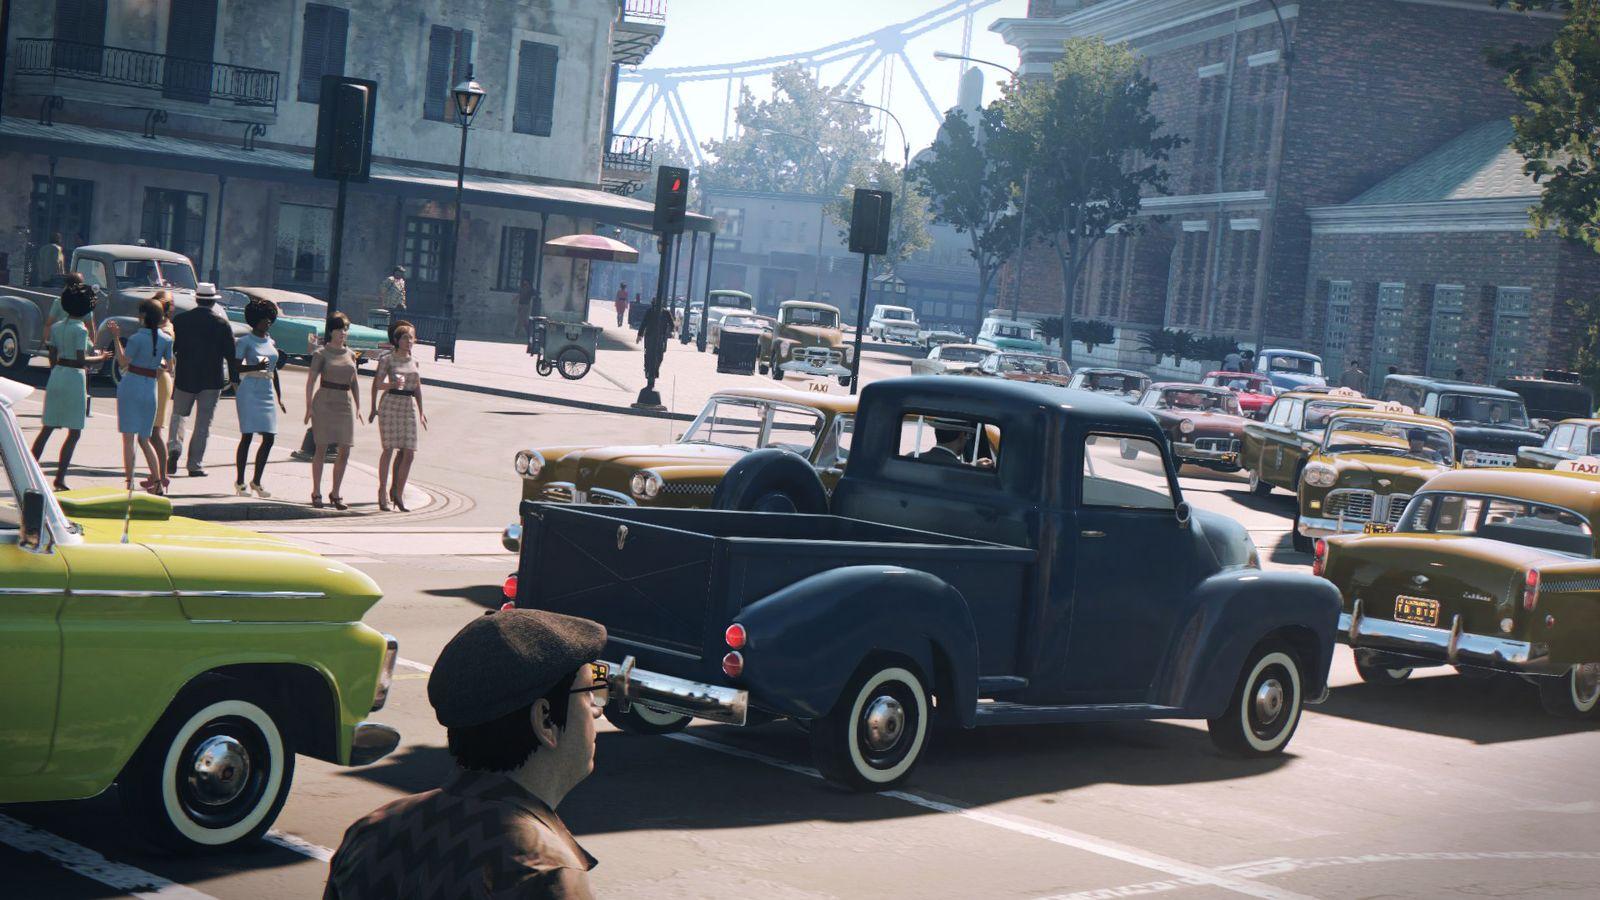 Spielemesse E3 / Mafia 3